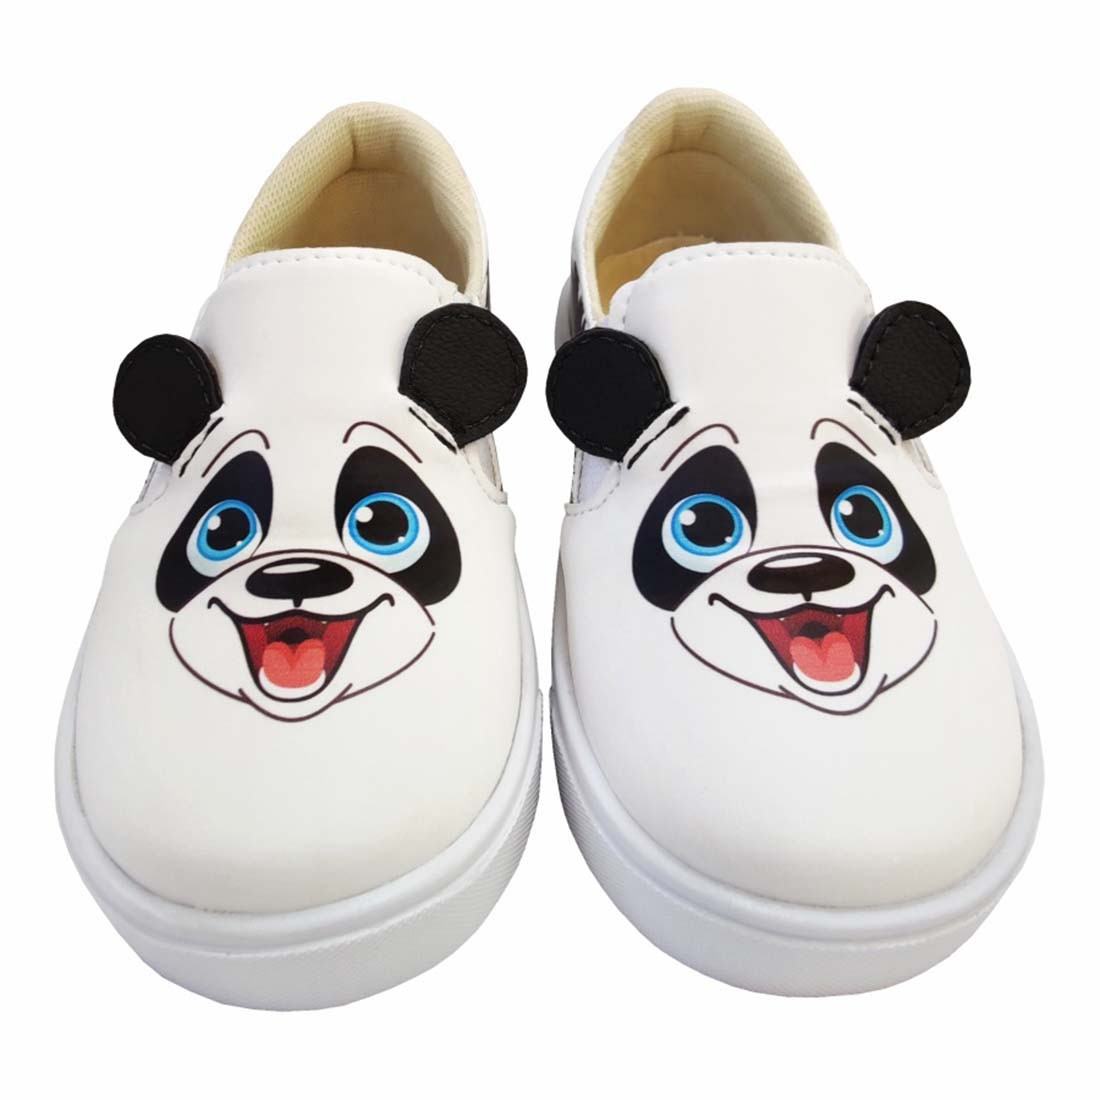 Tênis Infantil Iate Feminino Panda, Magicc Kids